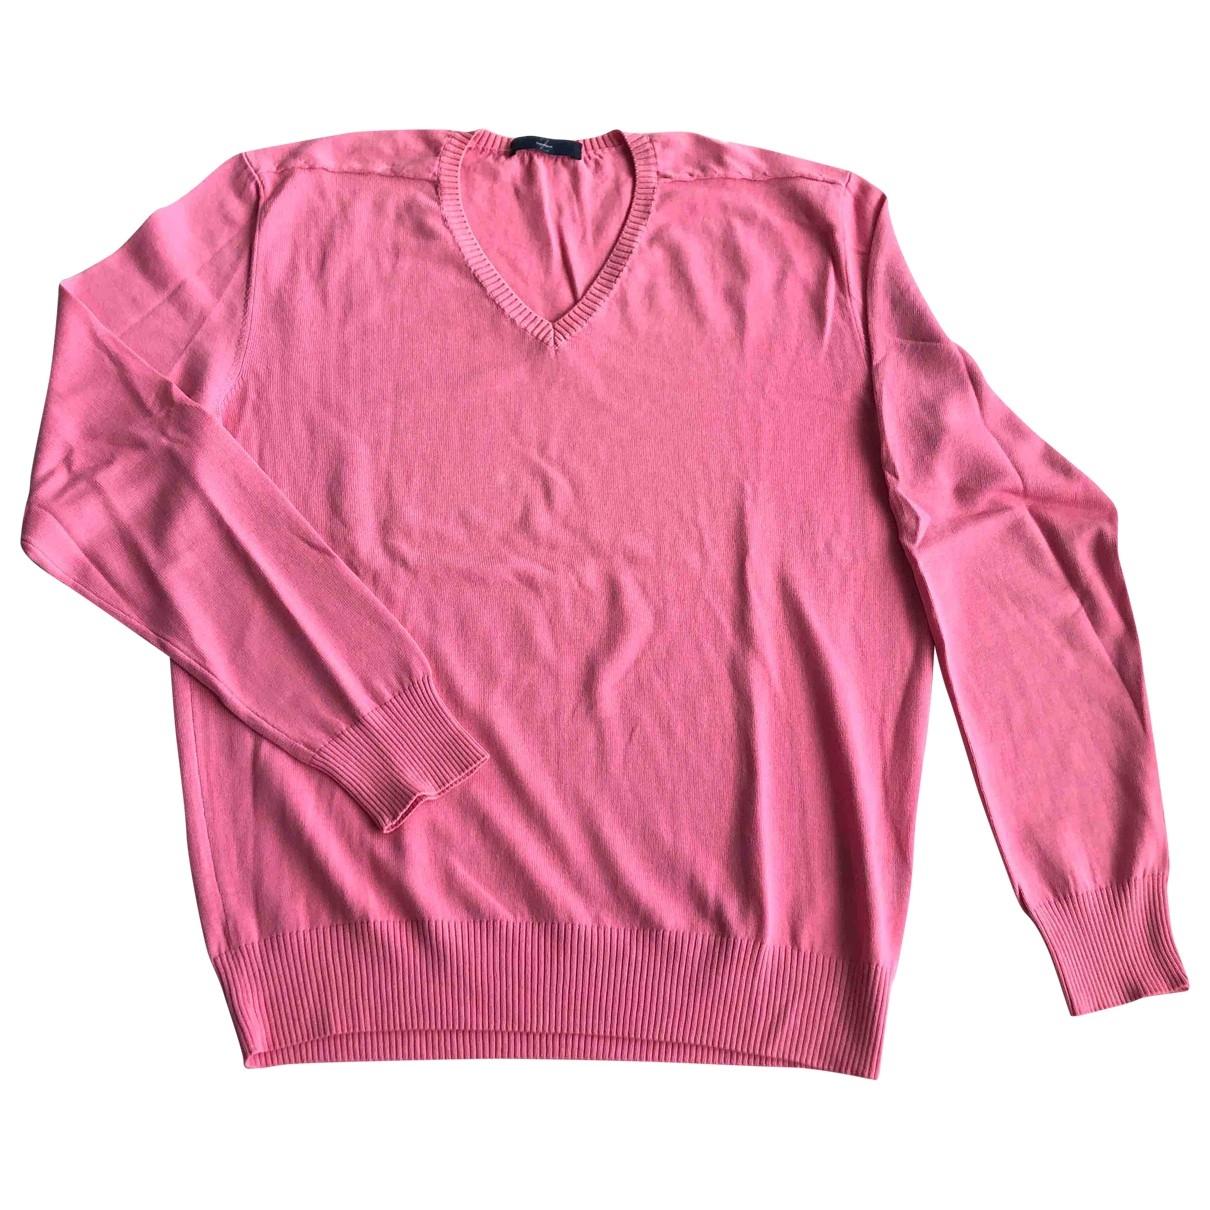 Z Zegna \N Pink Cotton Knitwear & Sweatshirts for Men M International